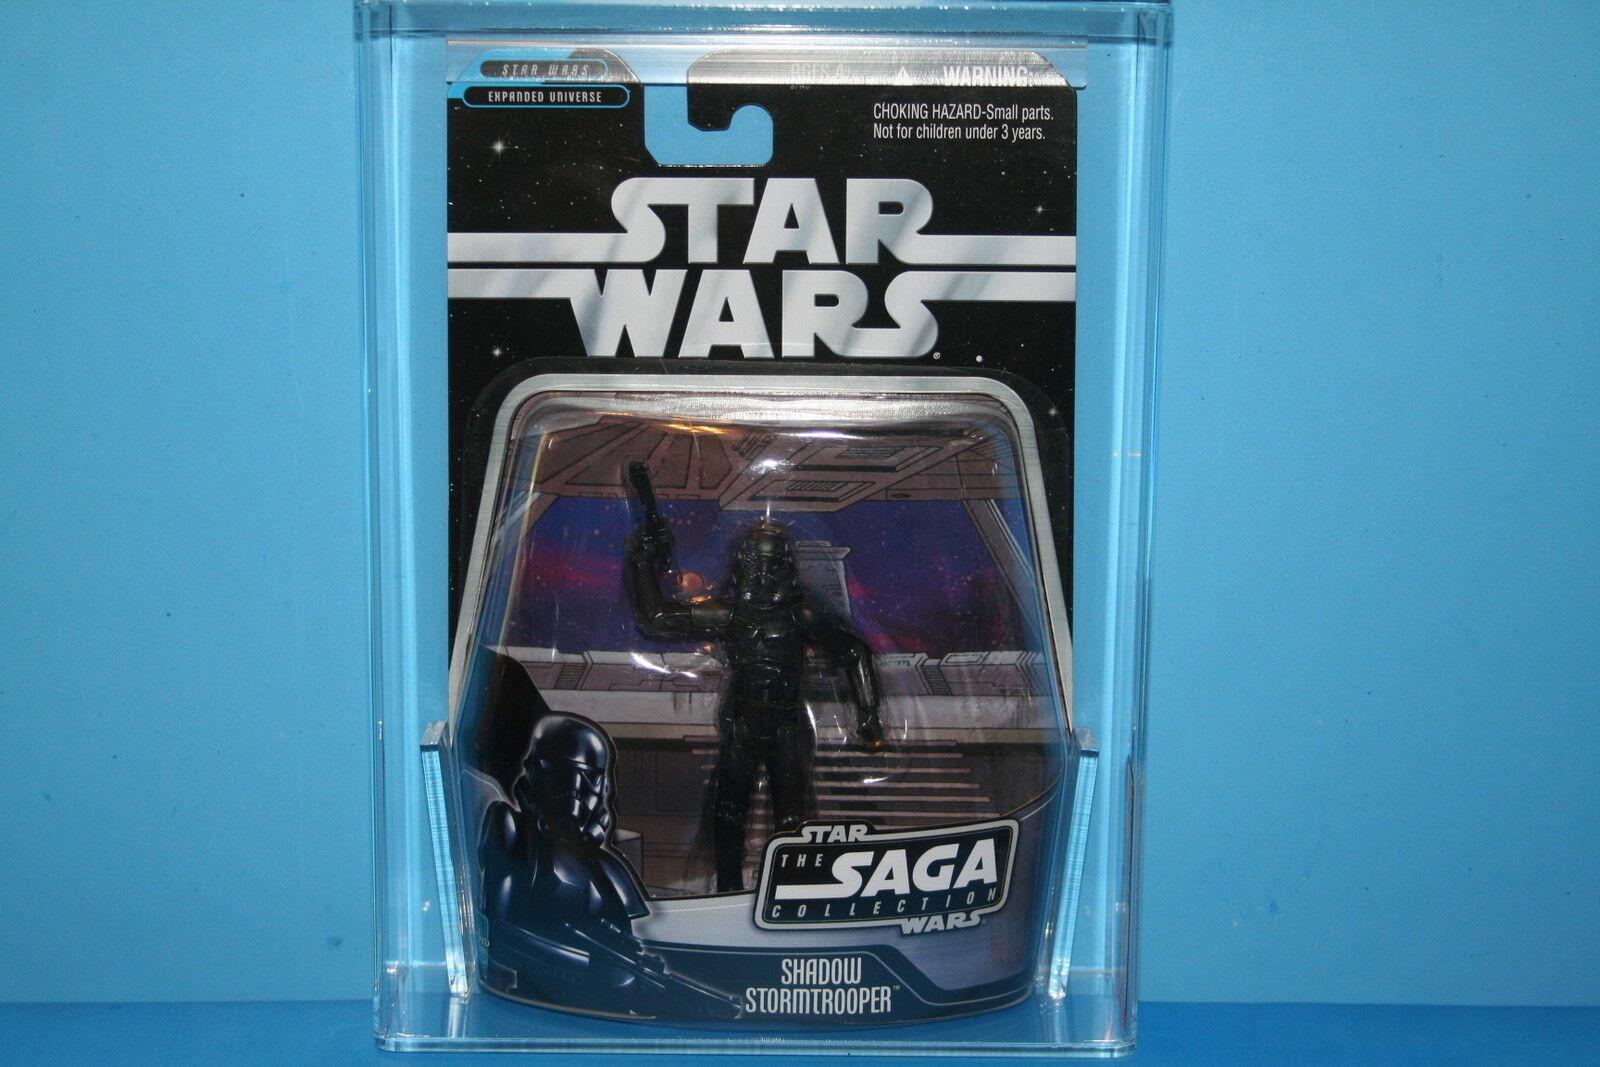 STAR WARS 06 Saga AFA classés Comme neuf on Card Shadow Stormtrooper exclusv 9.0 Figure